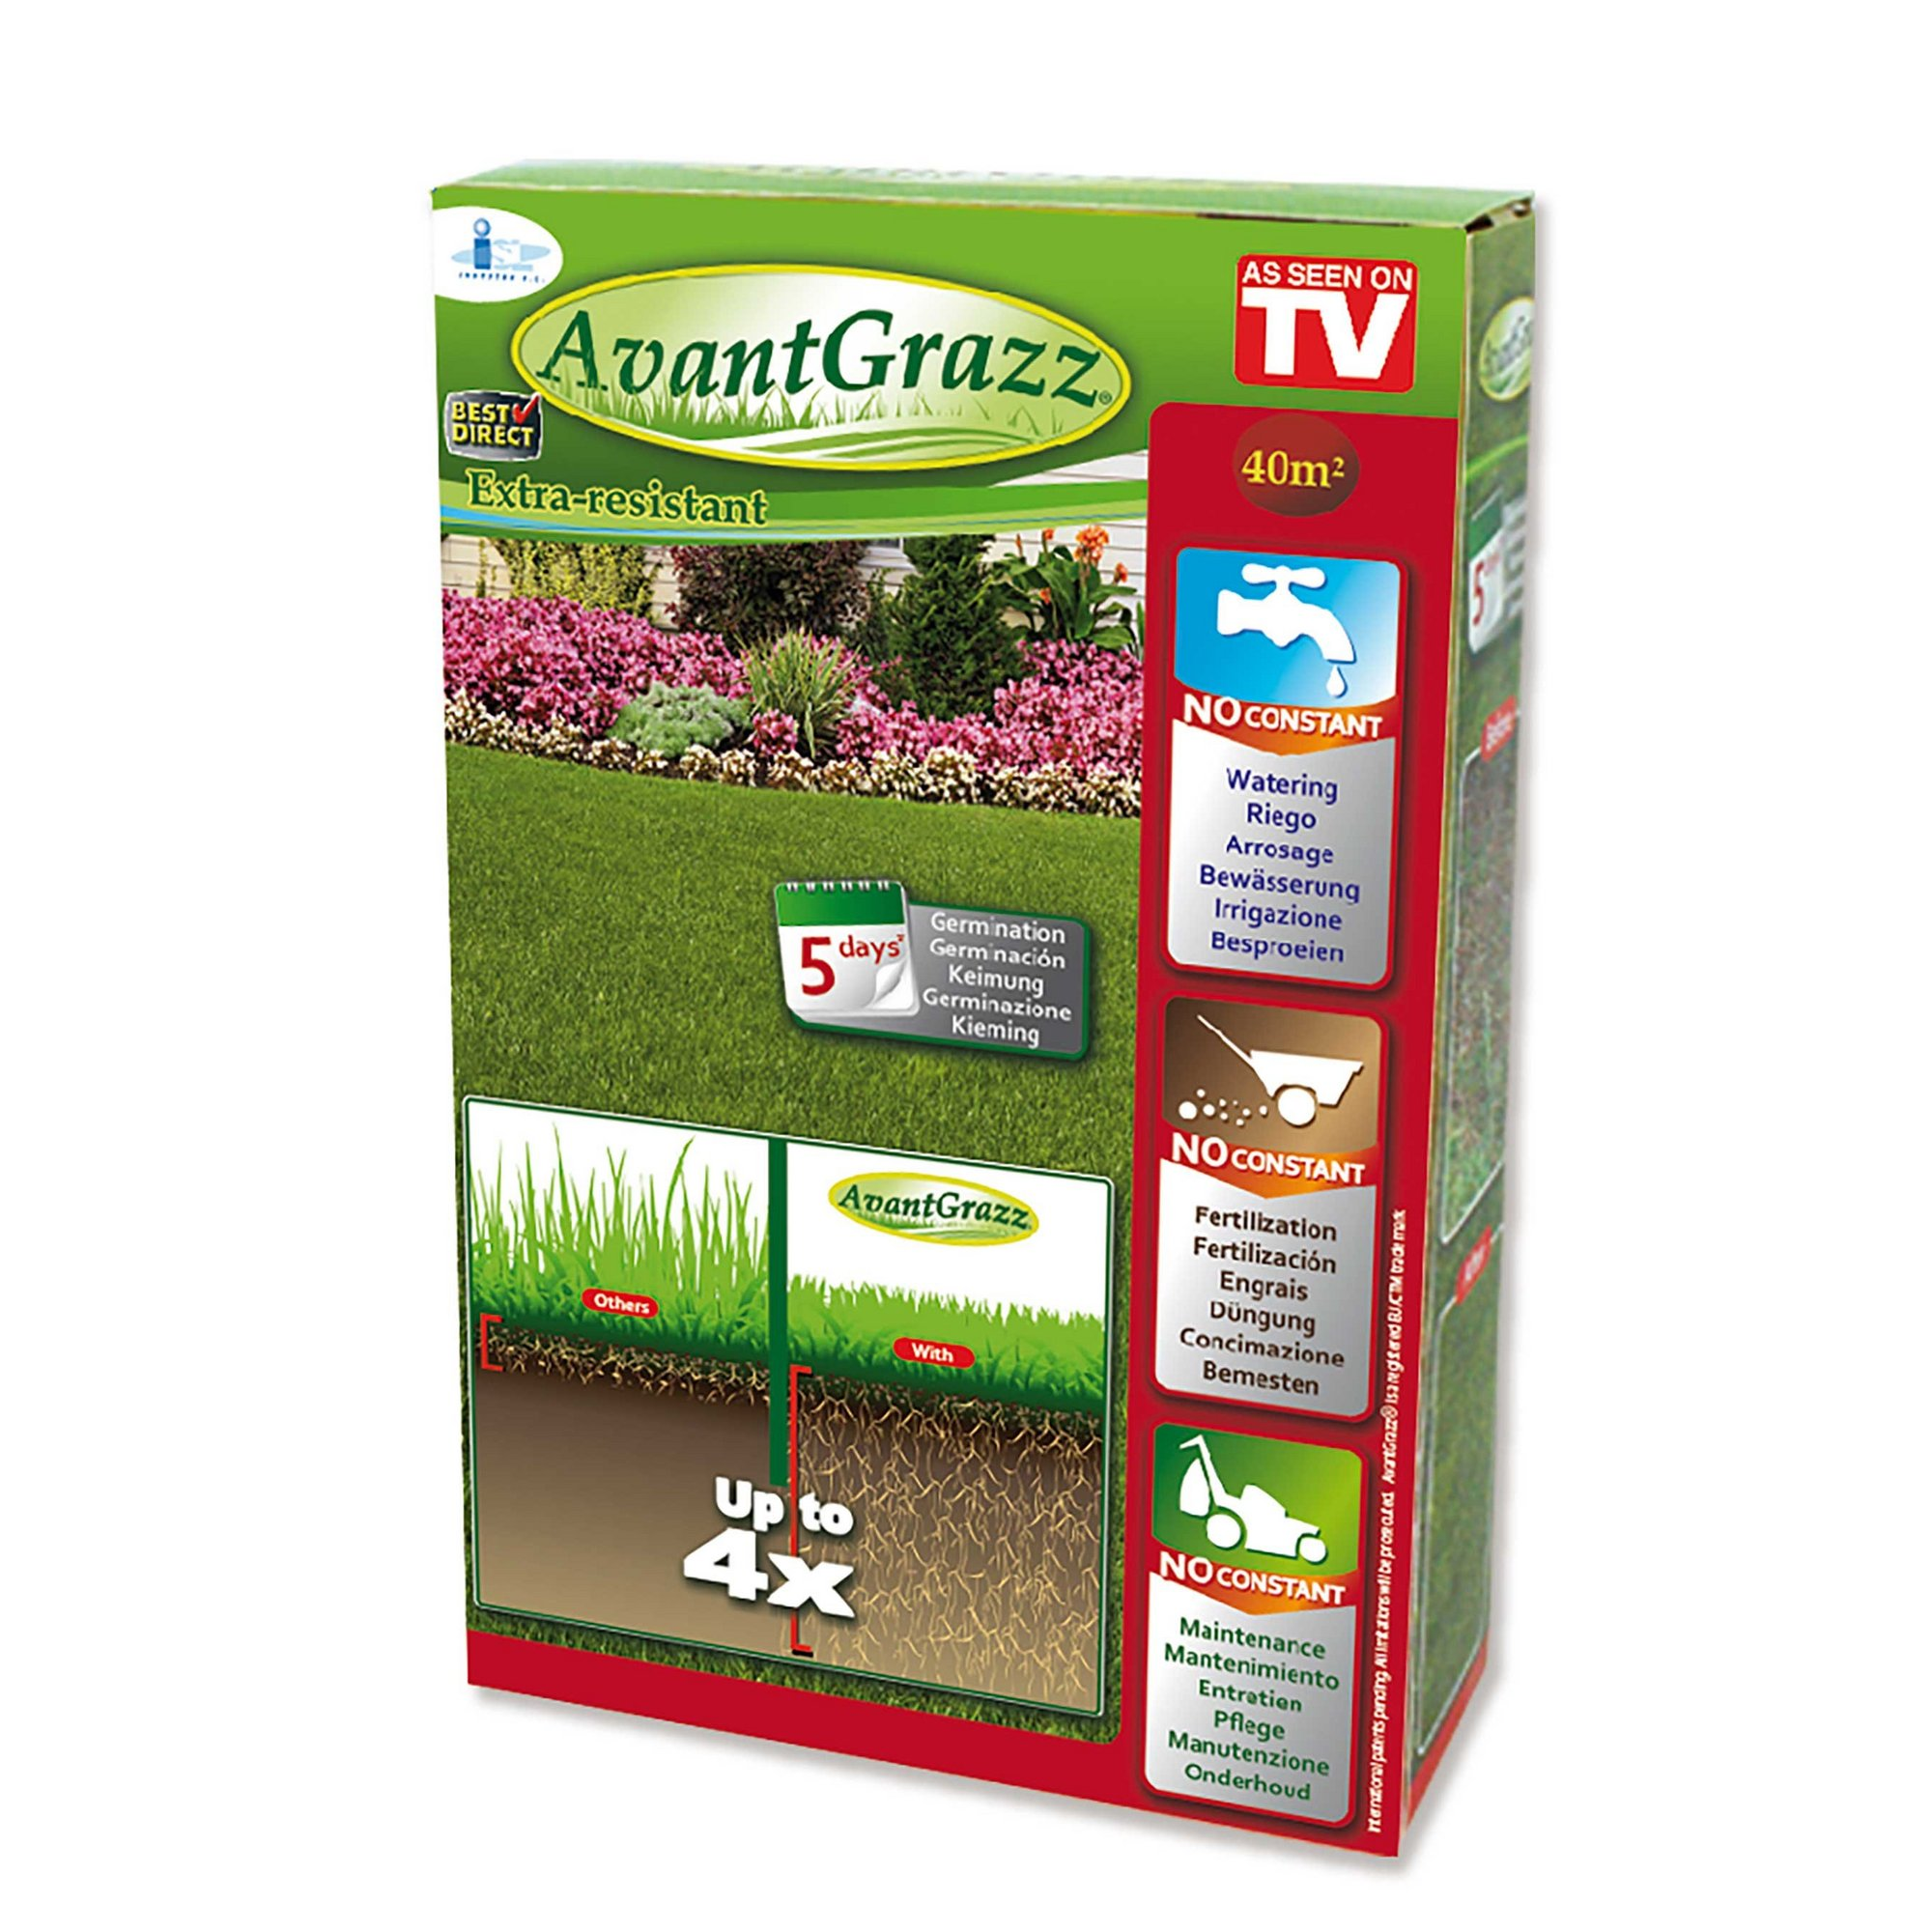 Image of Avant Grazz Lawn Seed